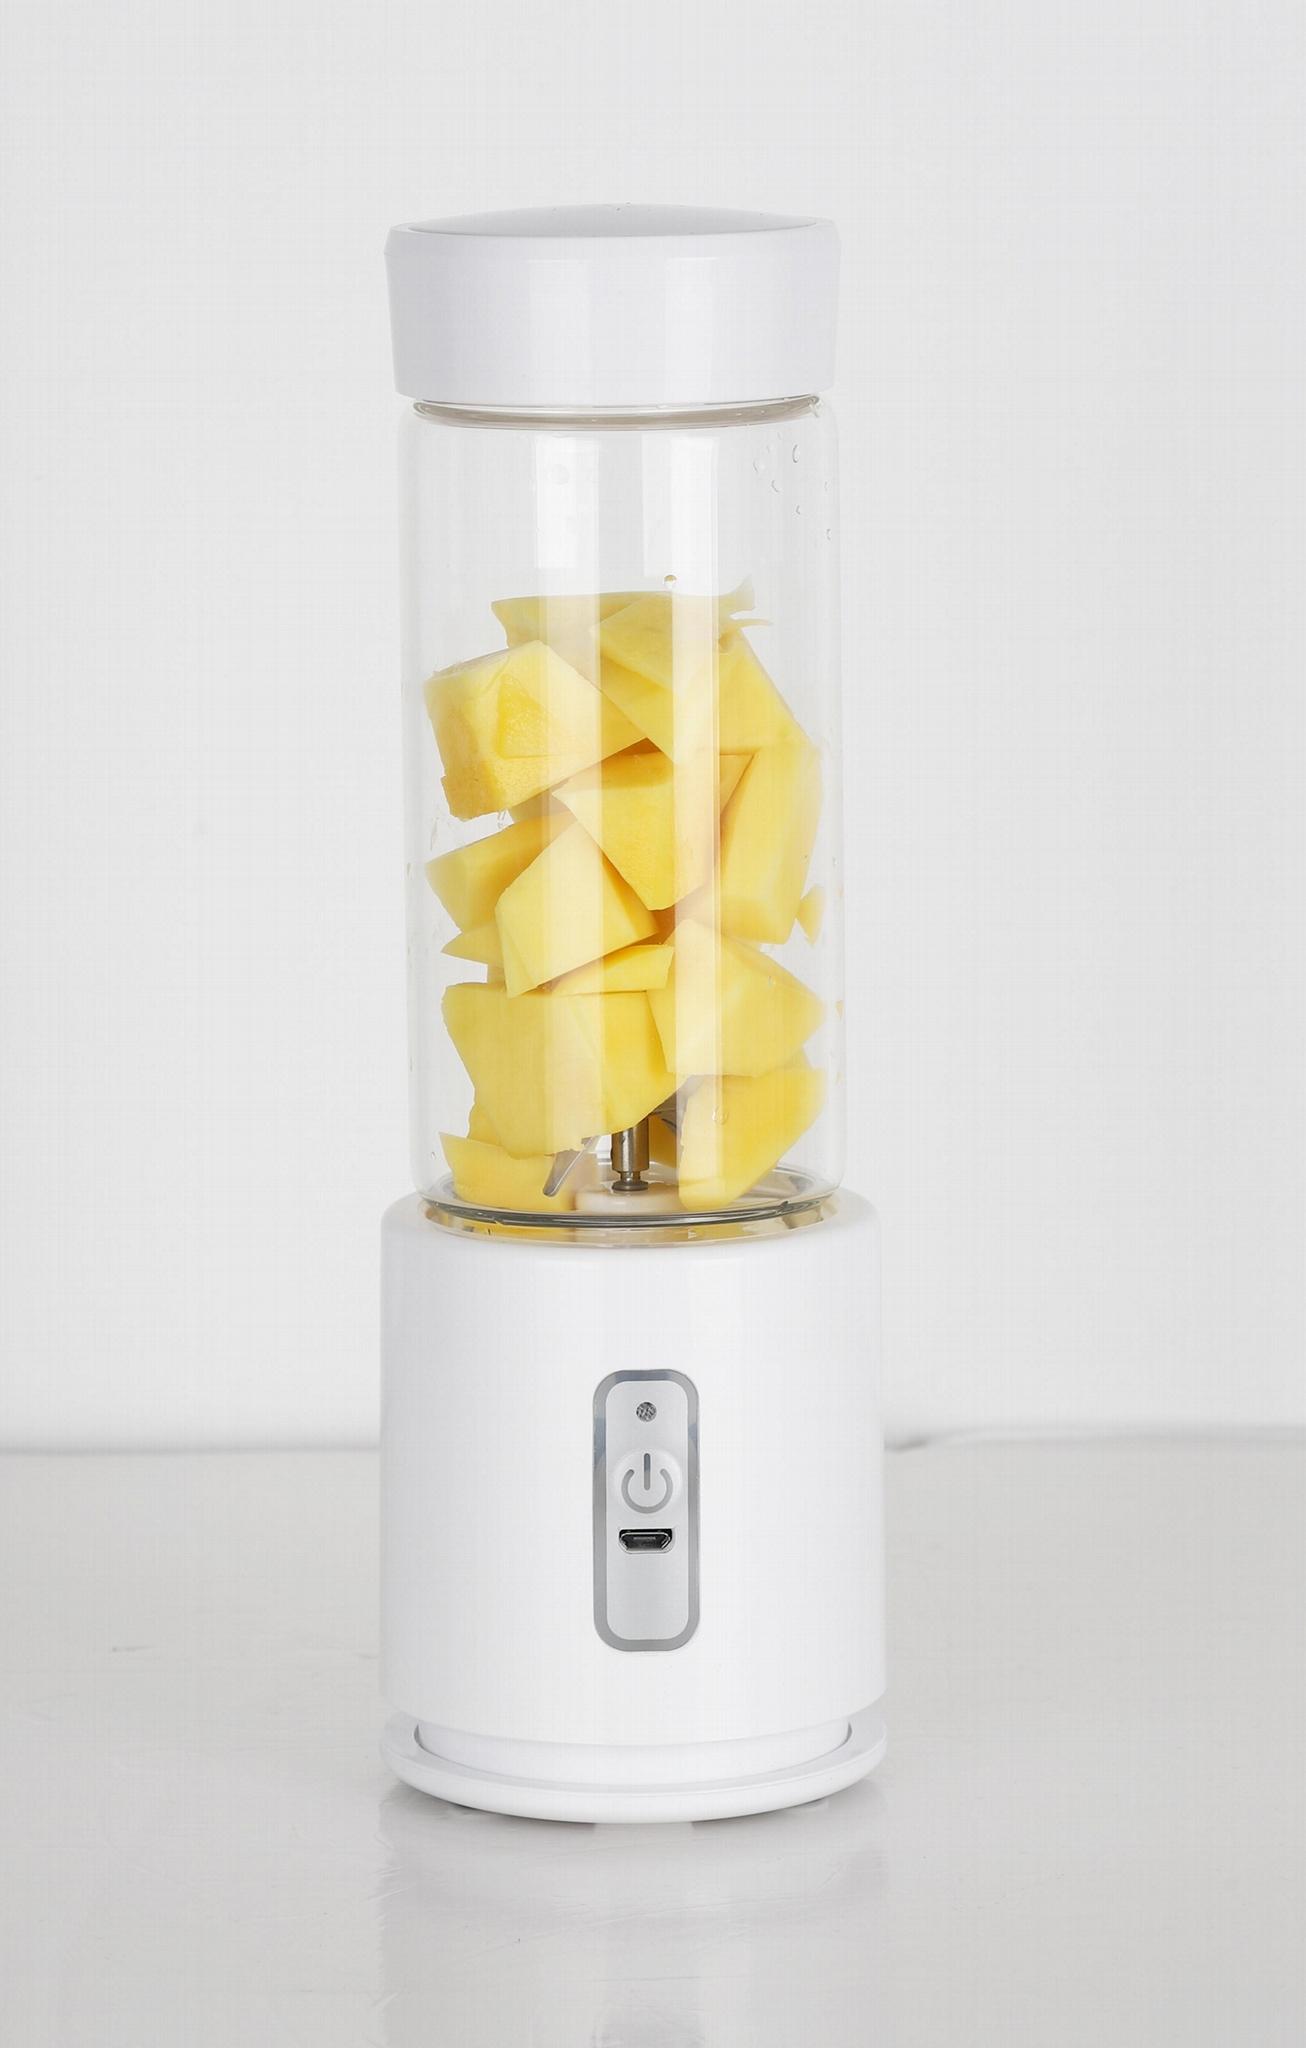 350ml 100W 4000mAh USB charging glass juicer cup mini blende 3